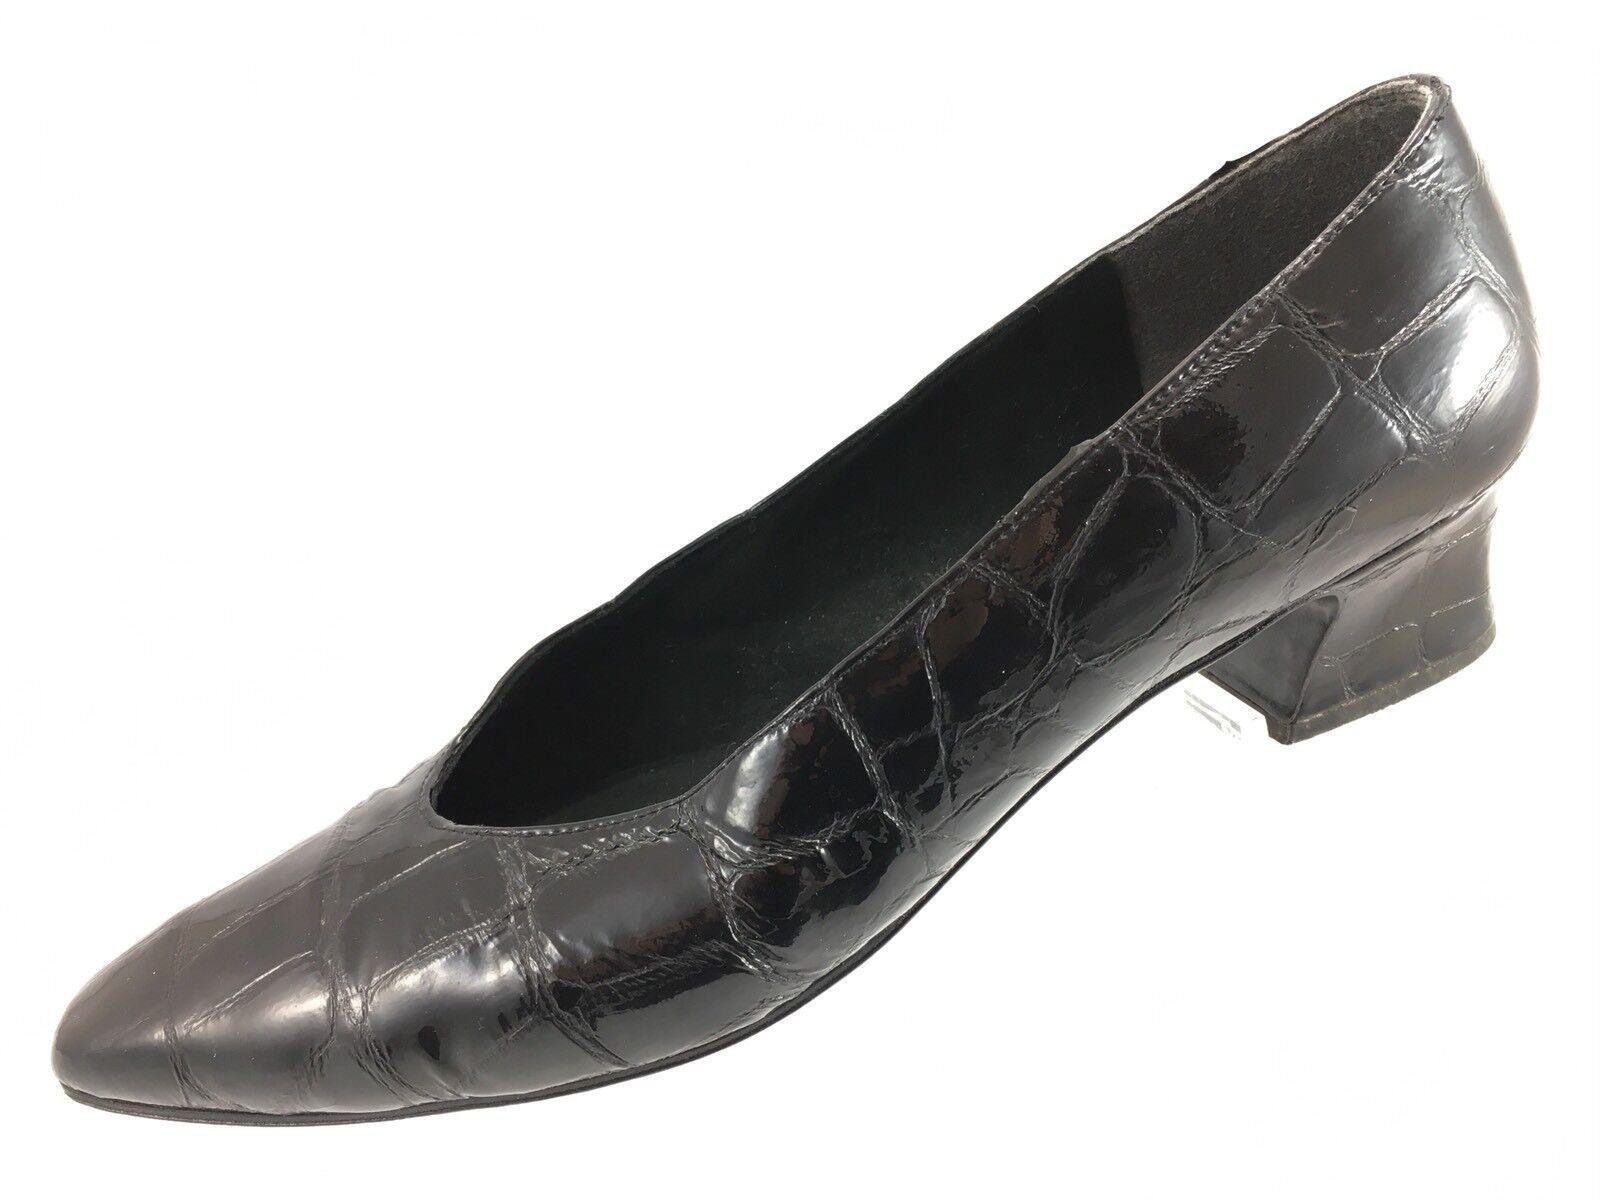 SH20 Stuart Weitzman 8.5AA Black Croc Patent Leather Block Kitten Heel shoes